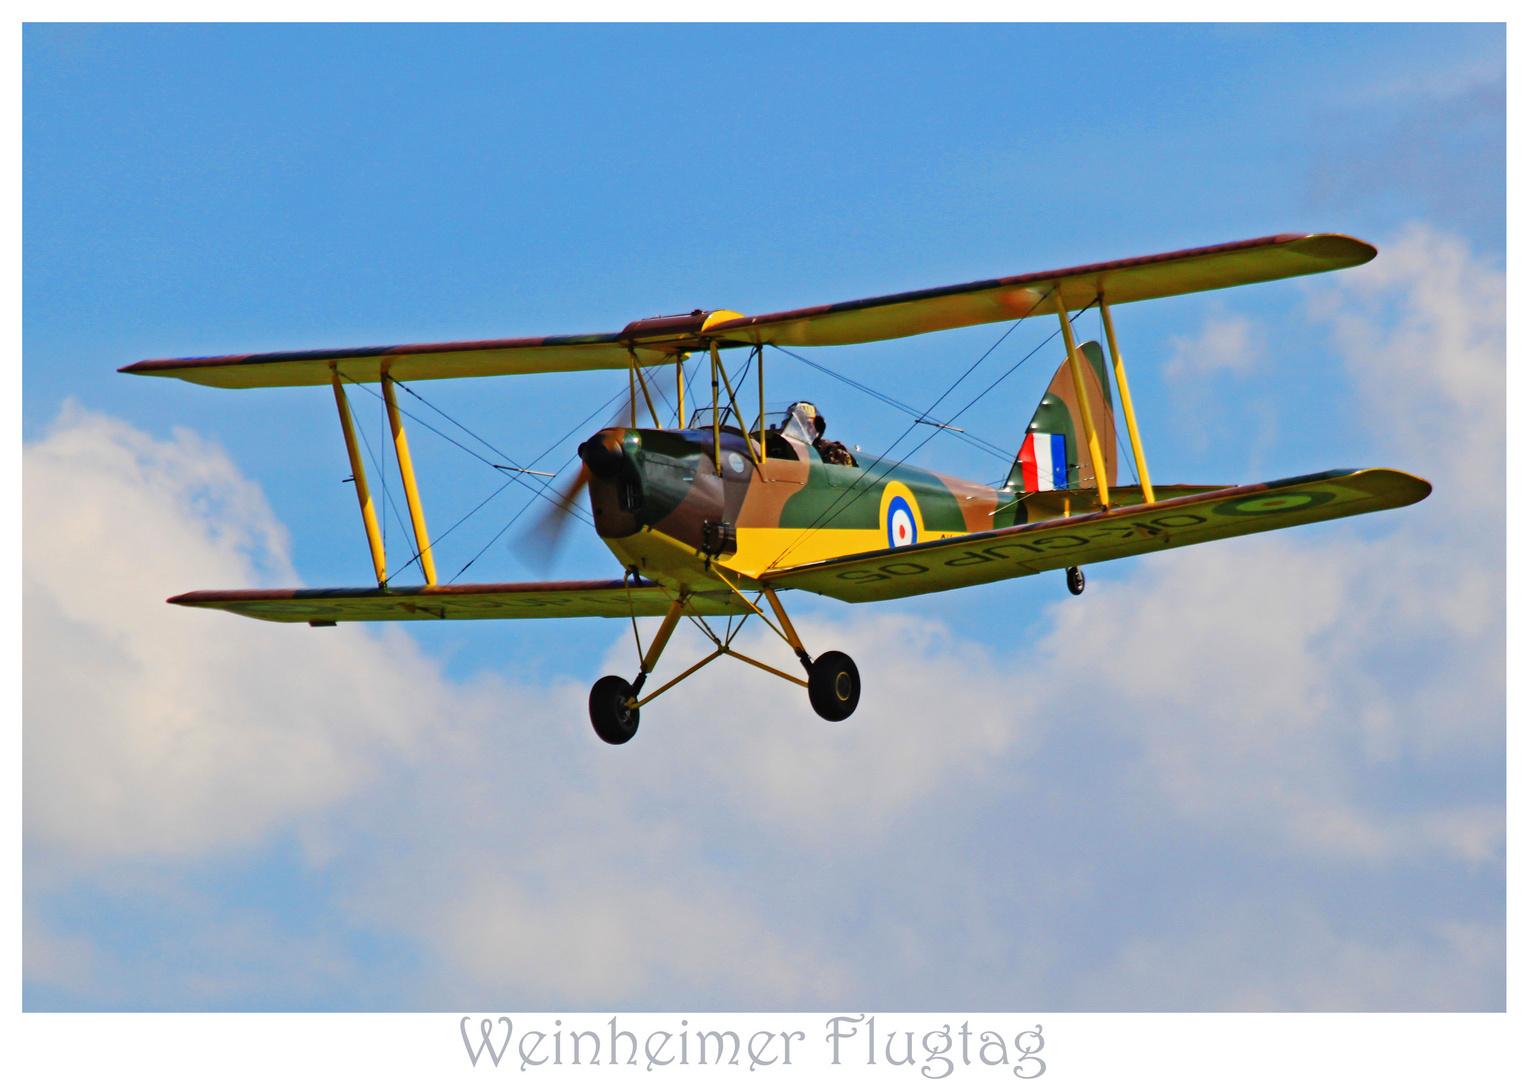 Weinheimer Flugtag